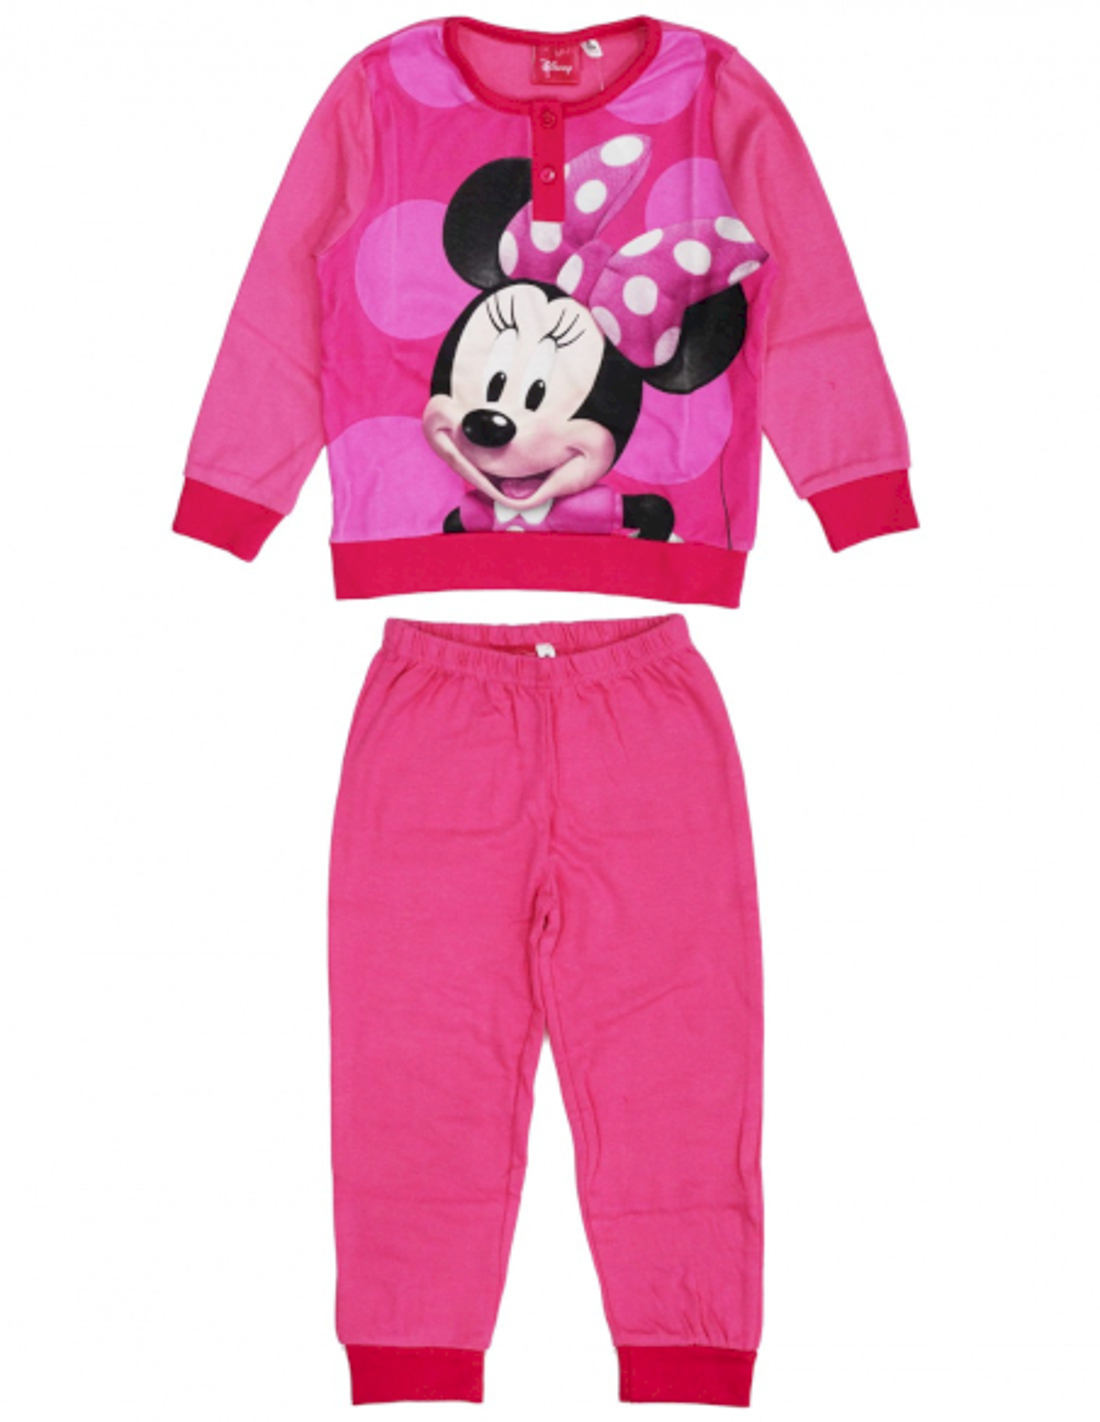 Pigiama Disney Minnie - Rosa 3 Anni